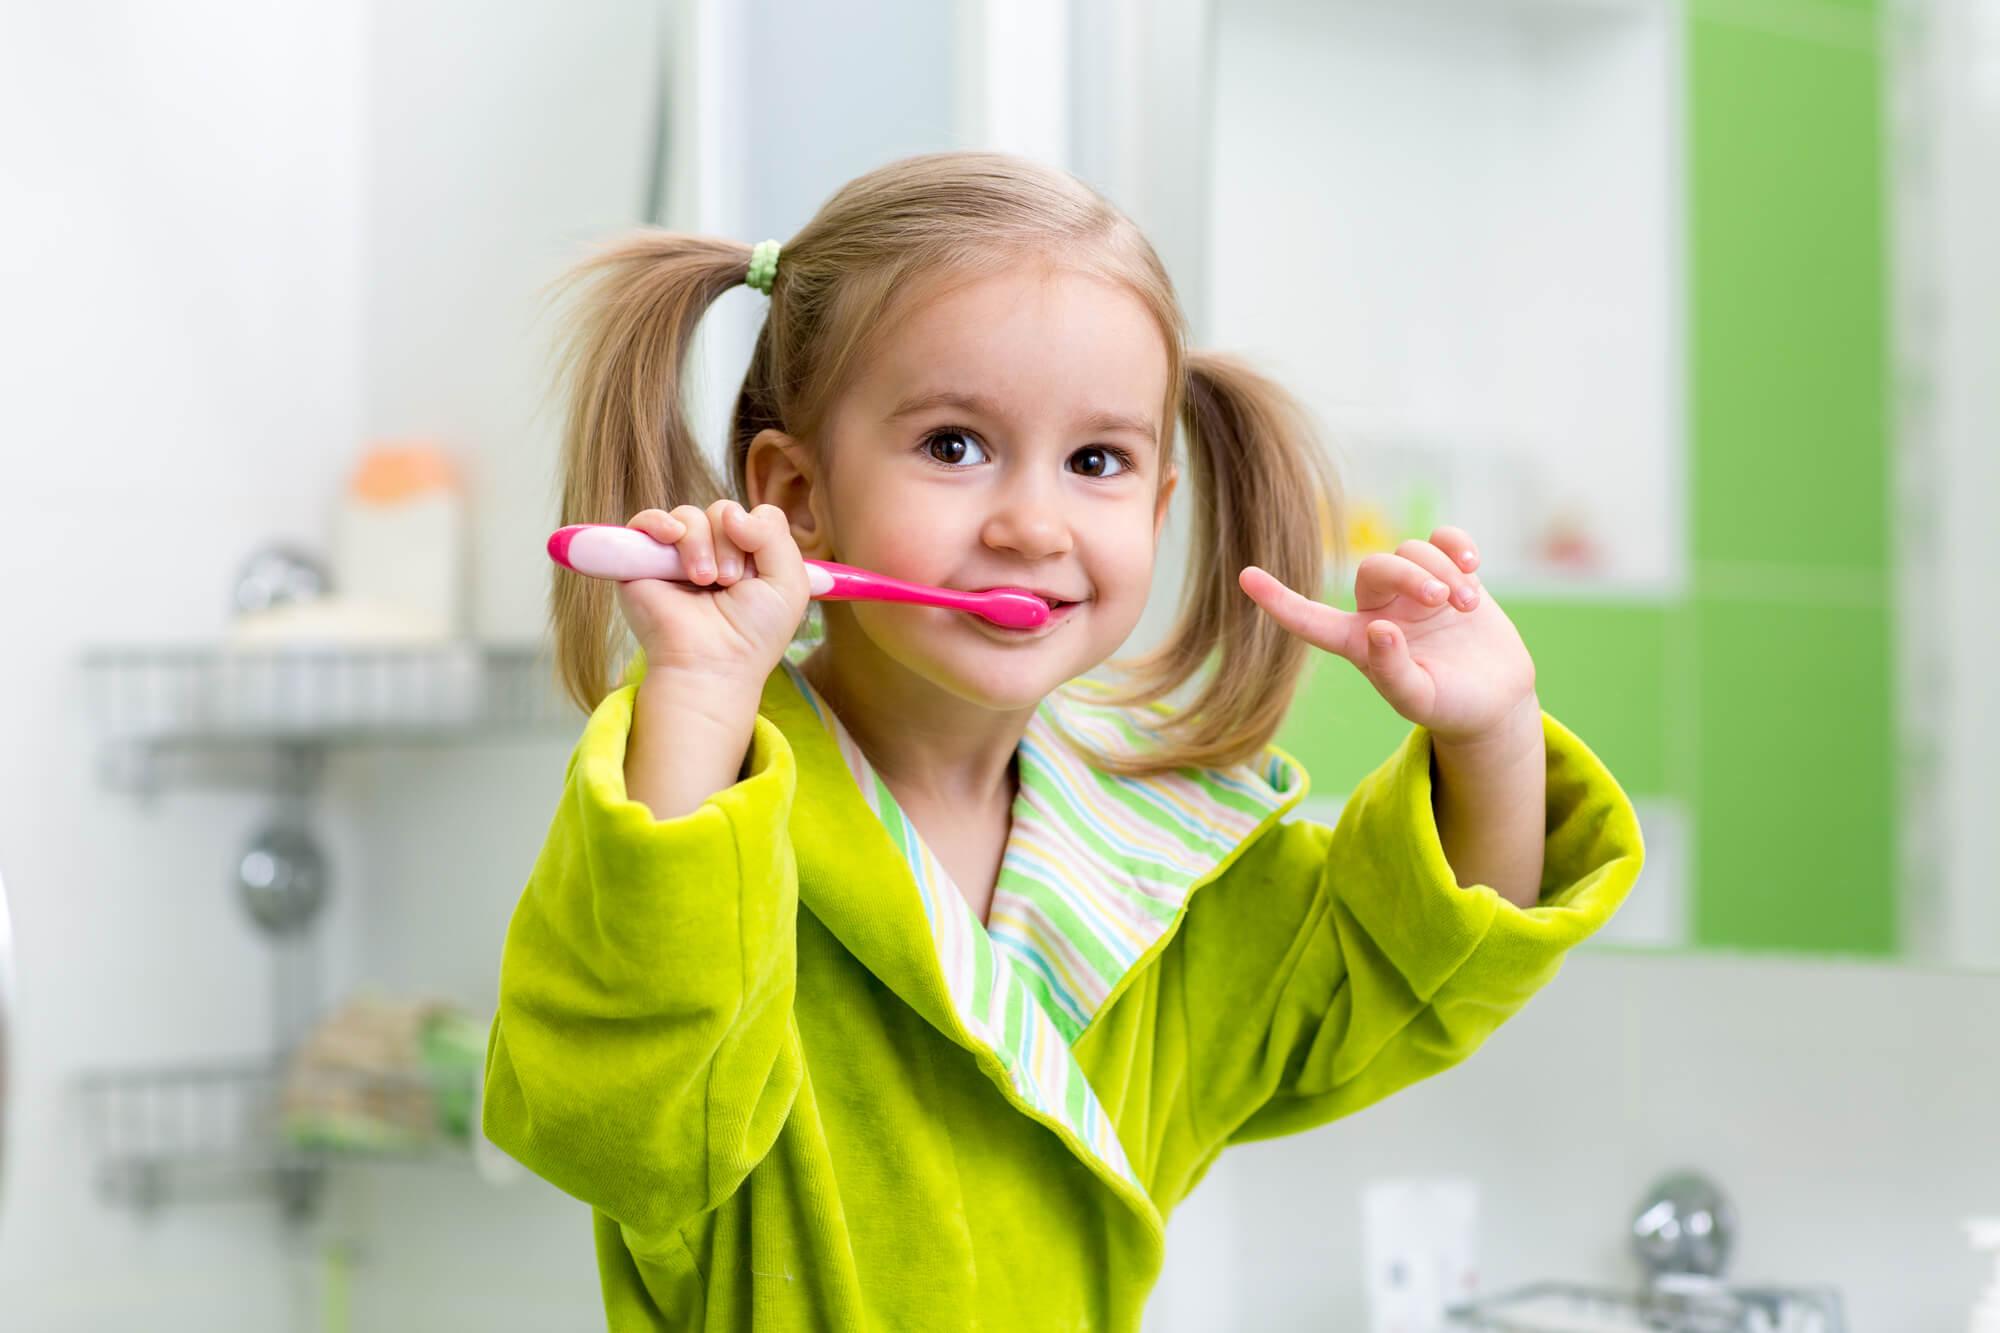 smiling child Accredited Pediatric Dentist Monsey New York